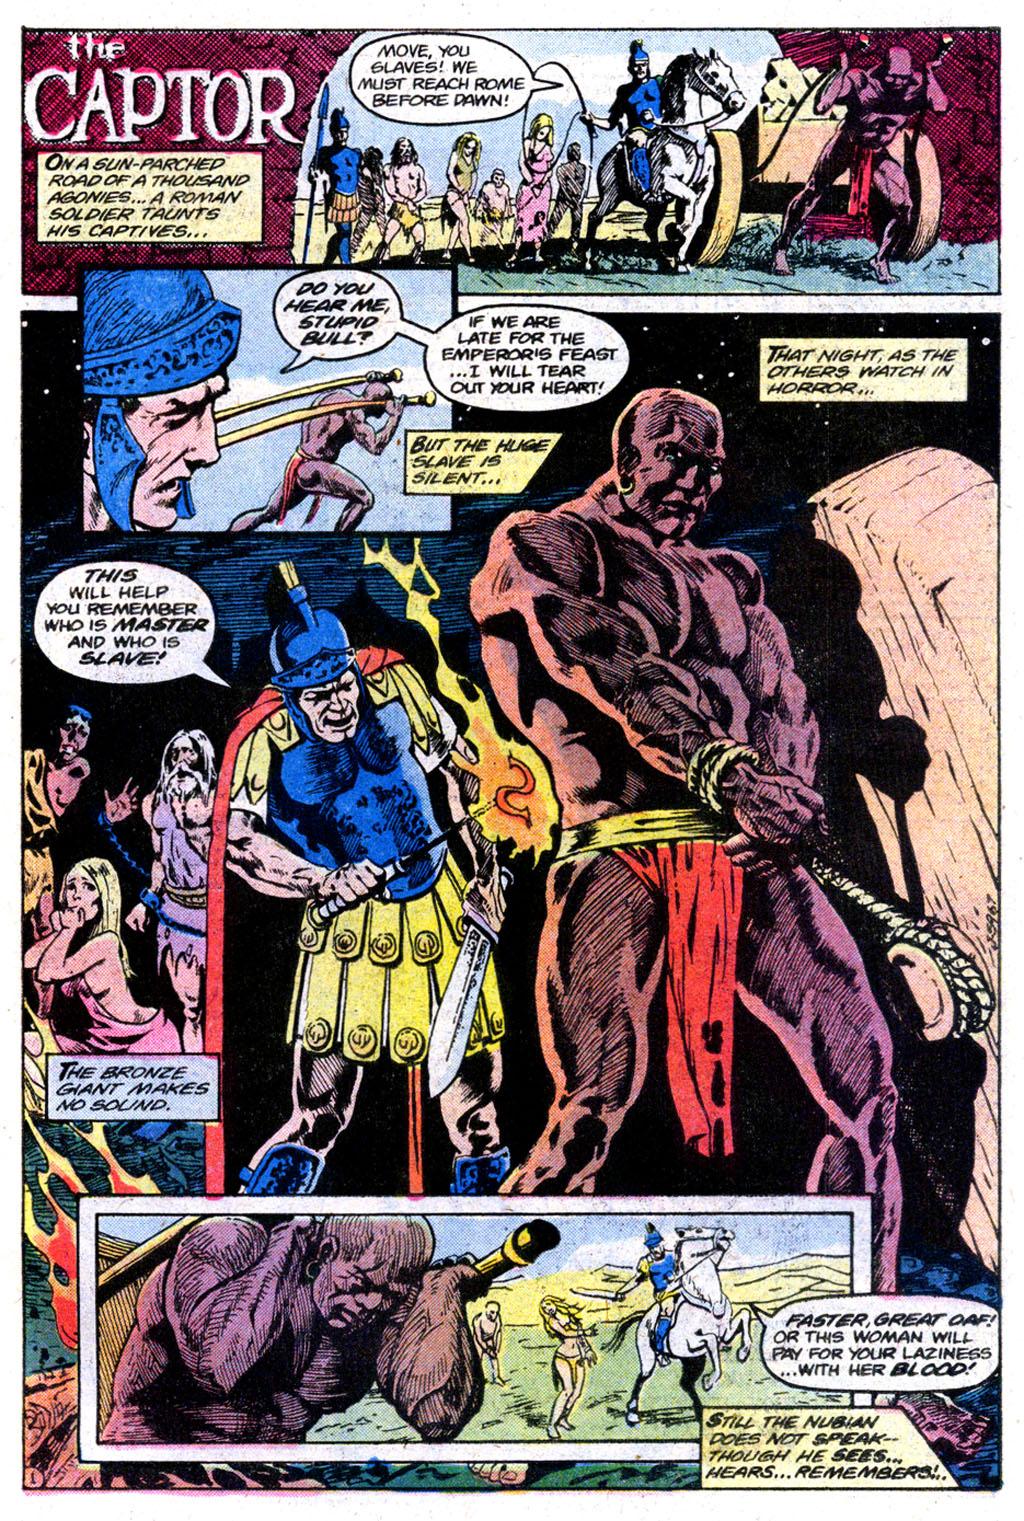 Read online Sgt. Rock comic -  Issue #340 - 19